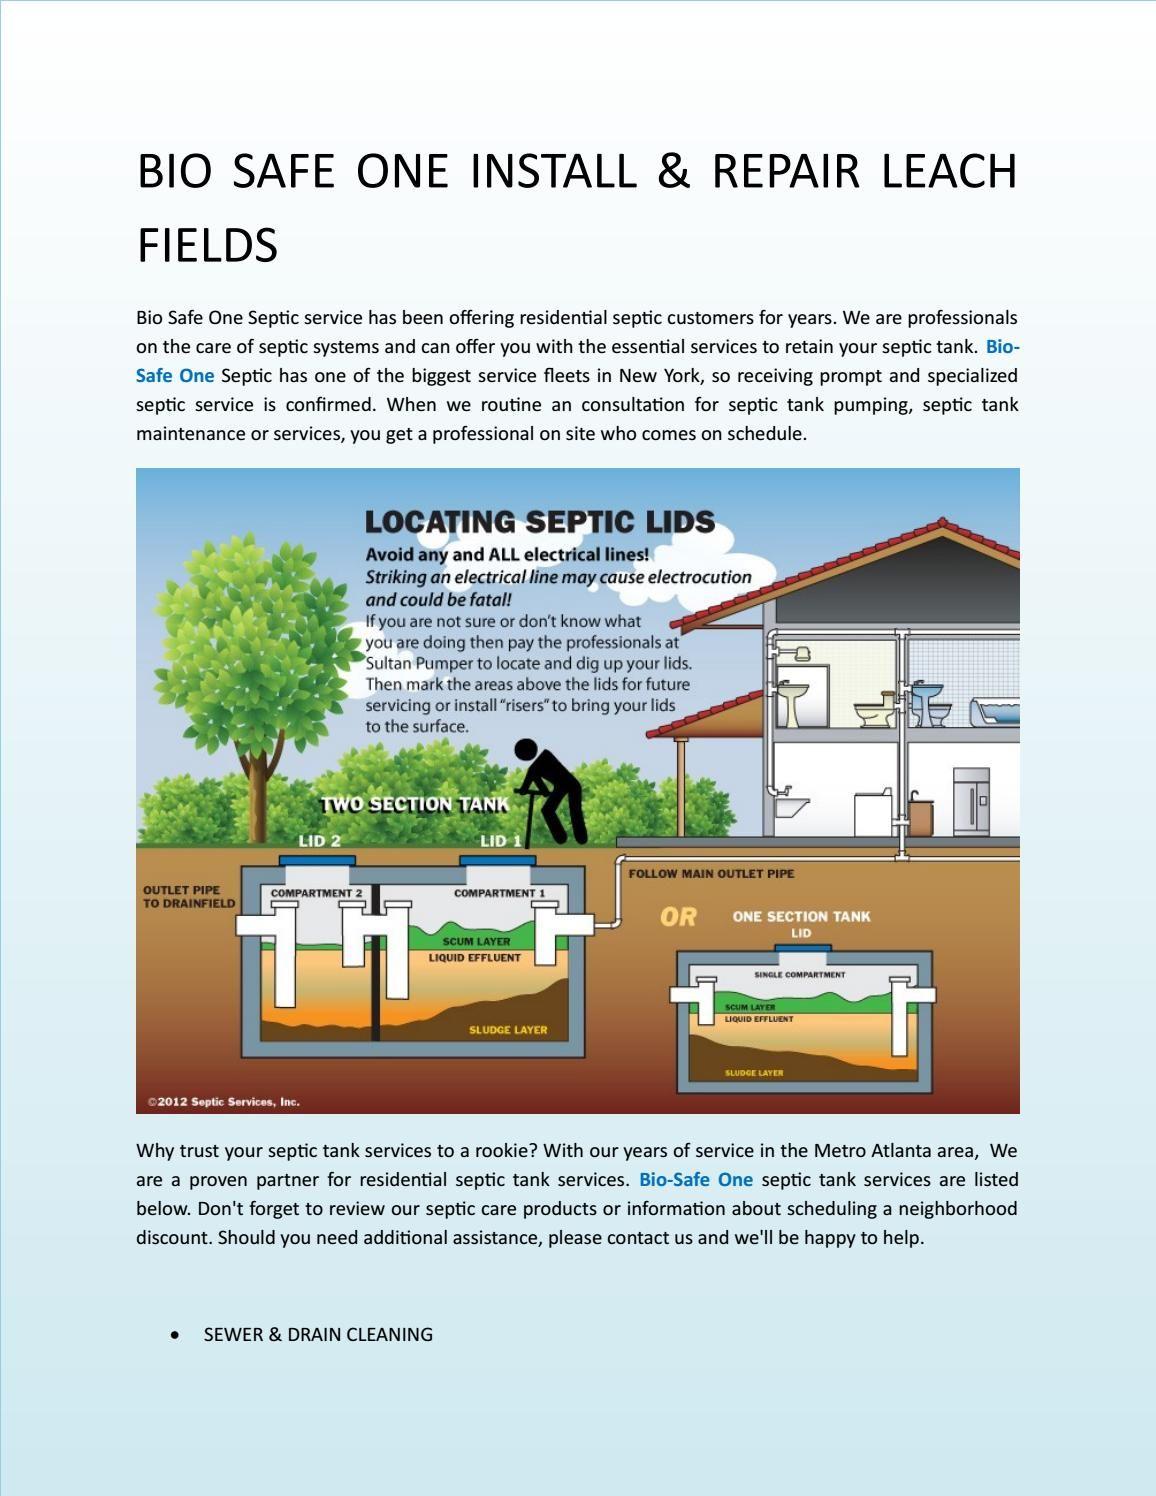 Bio safe one install & repair leach fields Septic tank